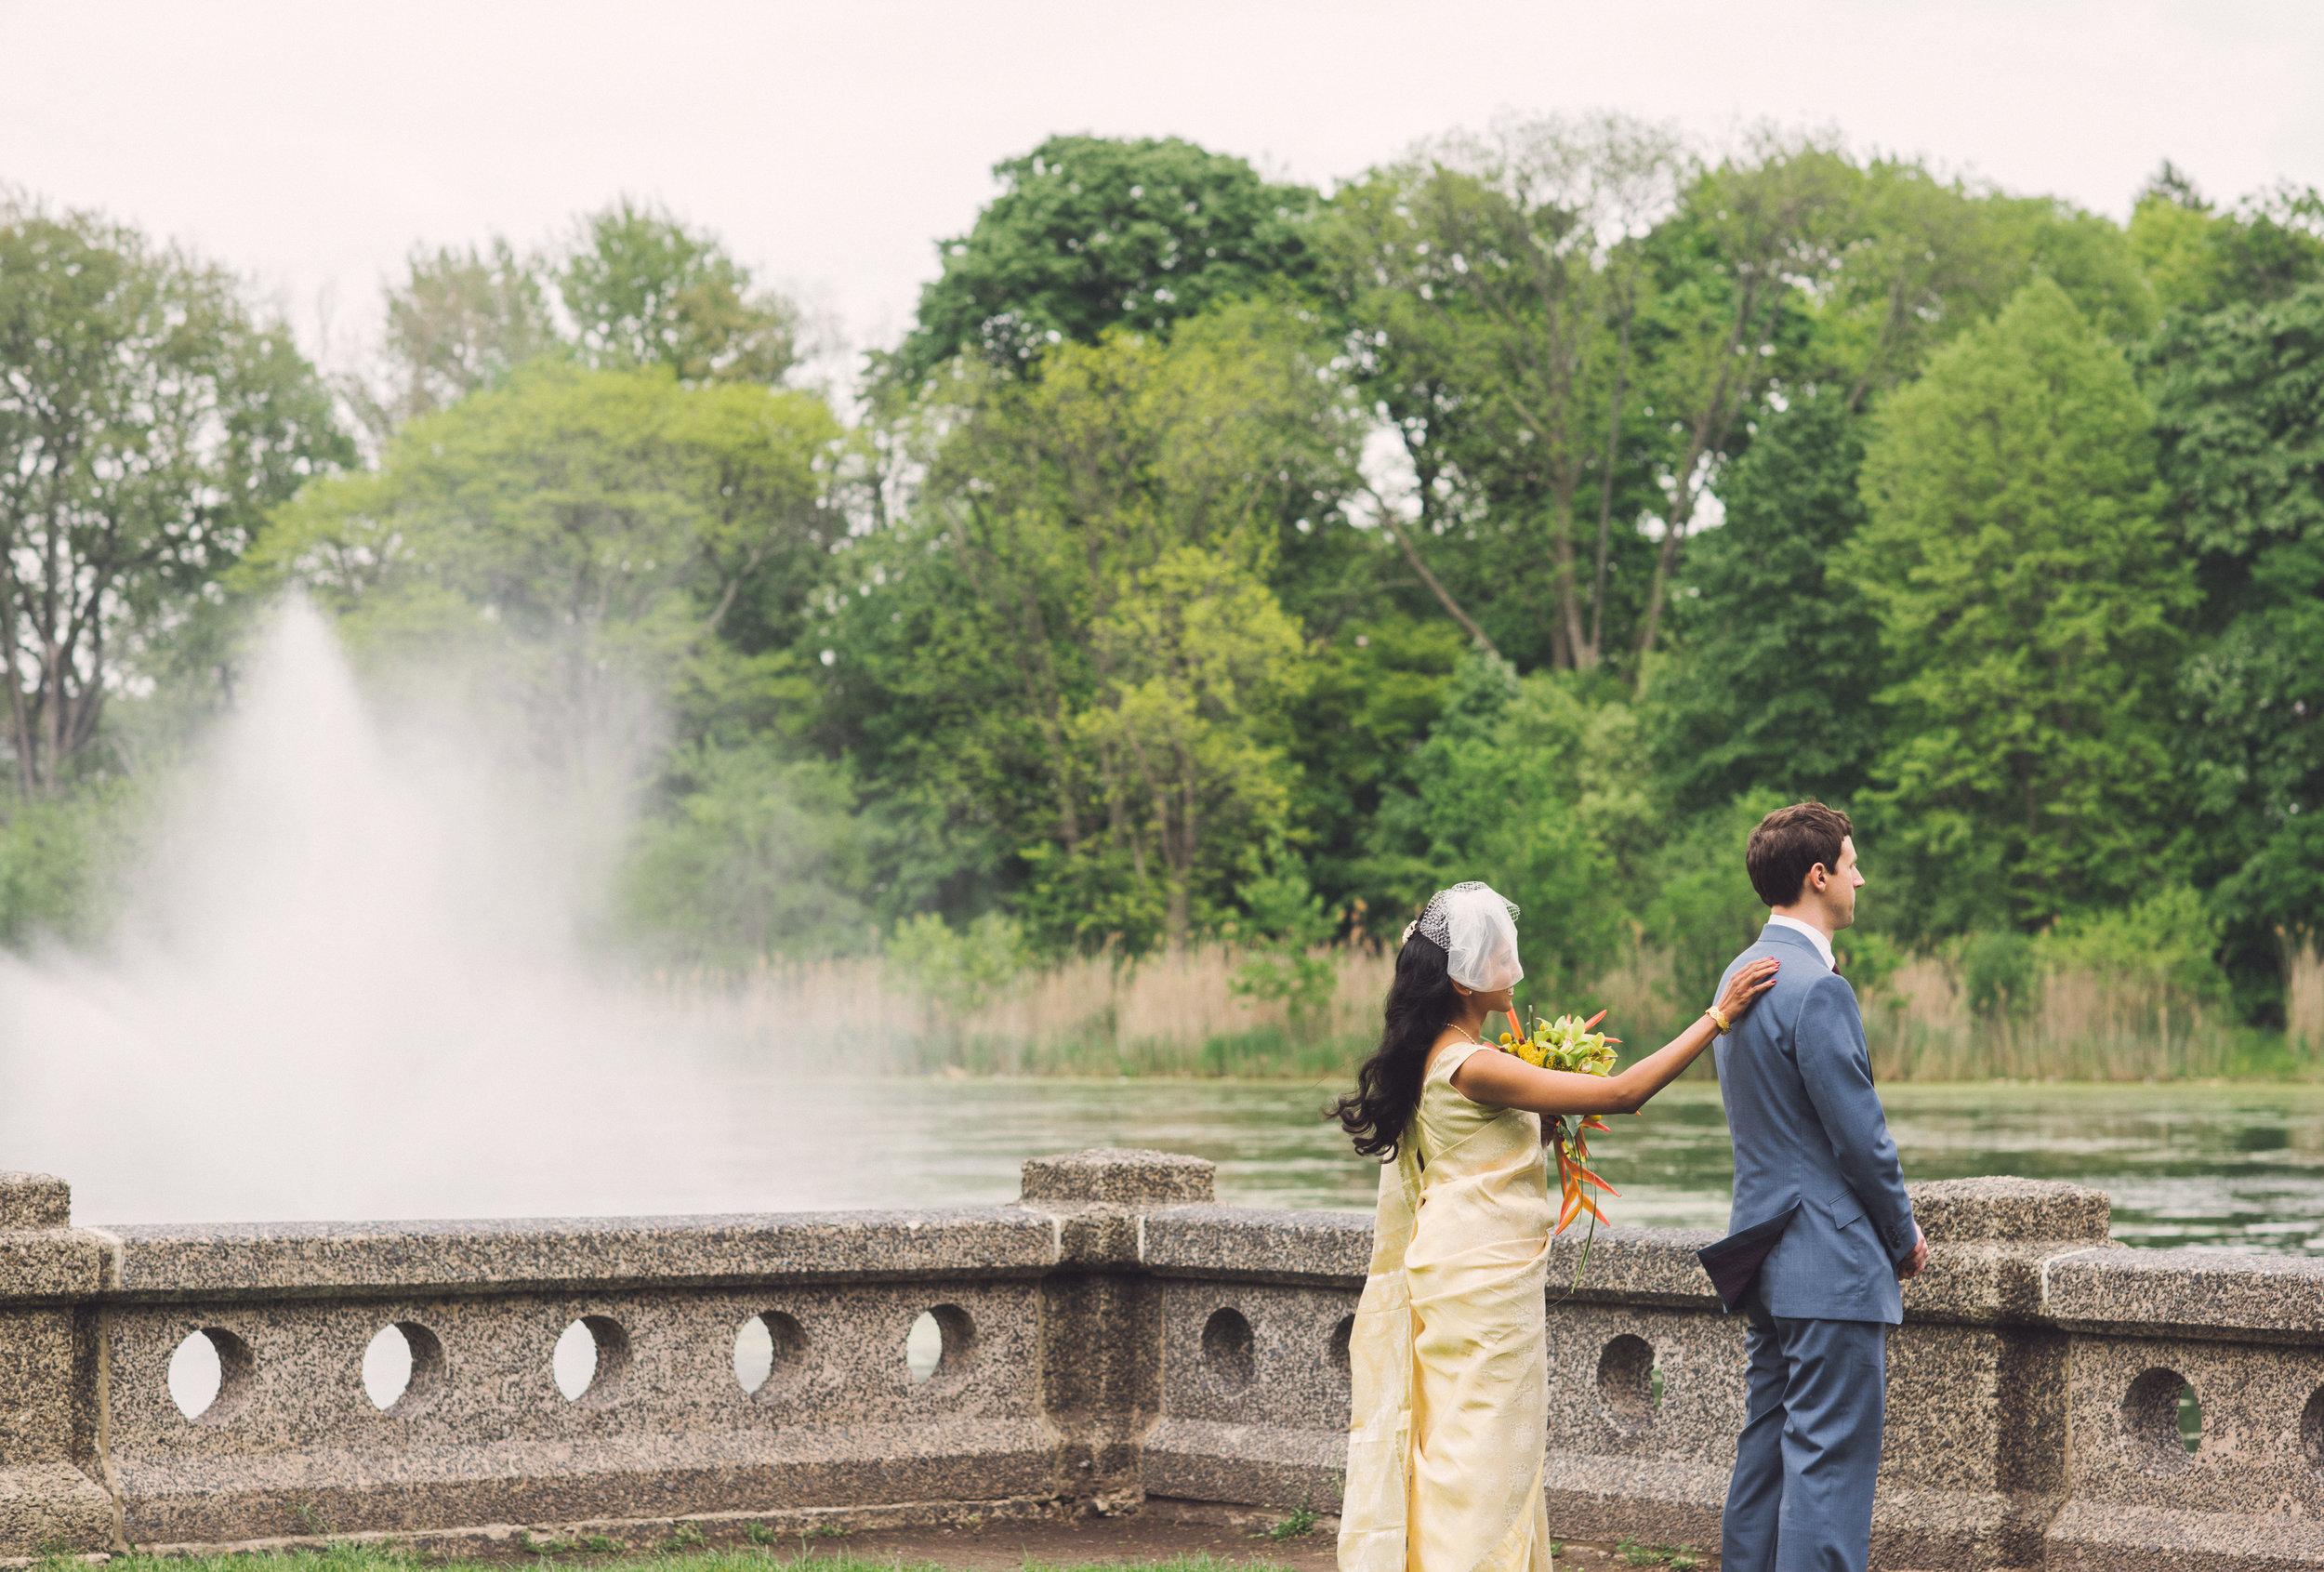 NEW YORK WEDDING PHOTOGRAPHER - TWOTWENTY by CHI-CHI AGBIM-6.jpg